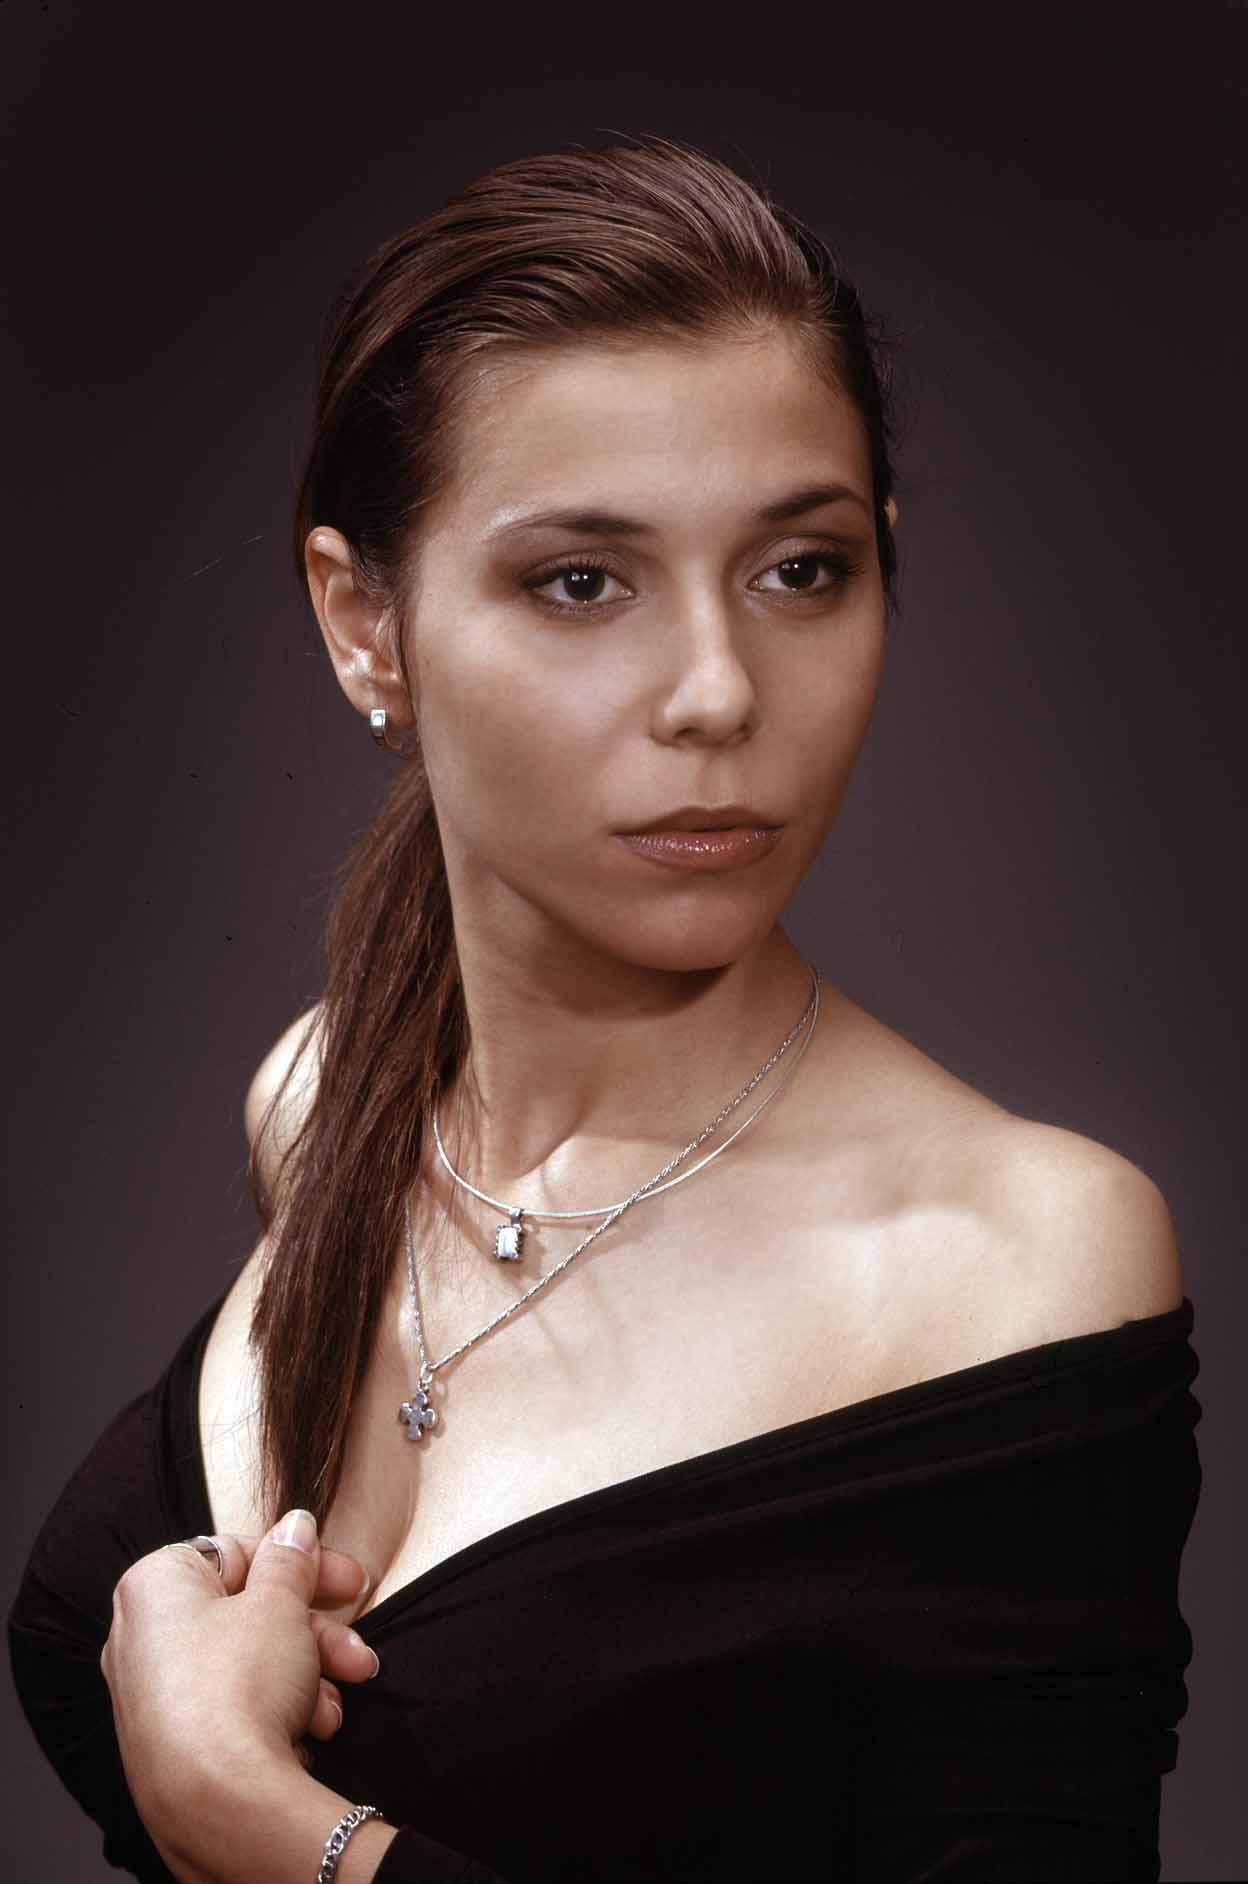 Даниела Караиванова